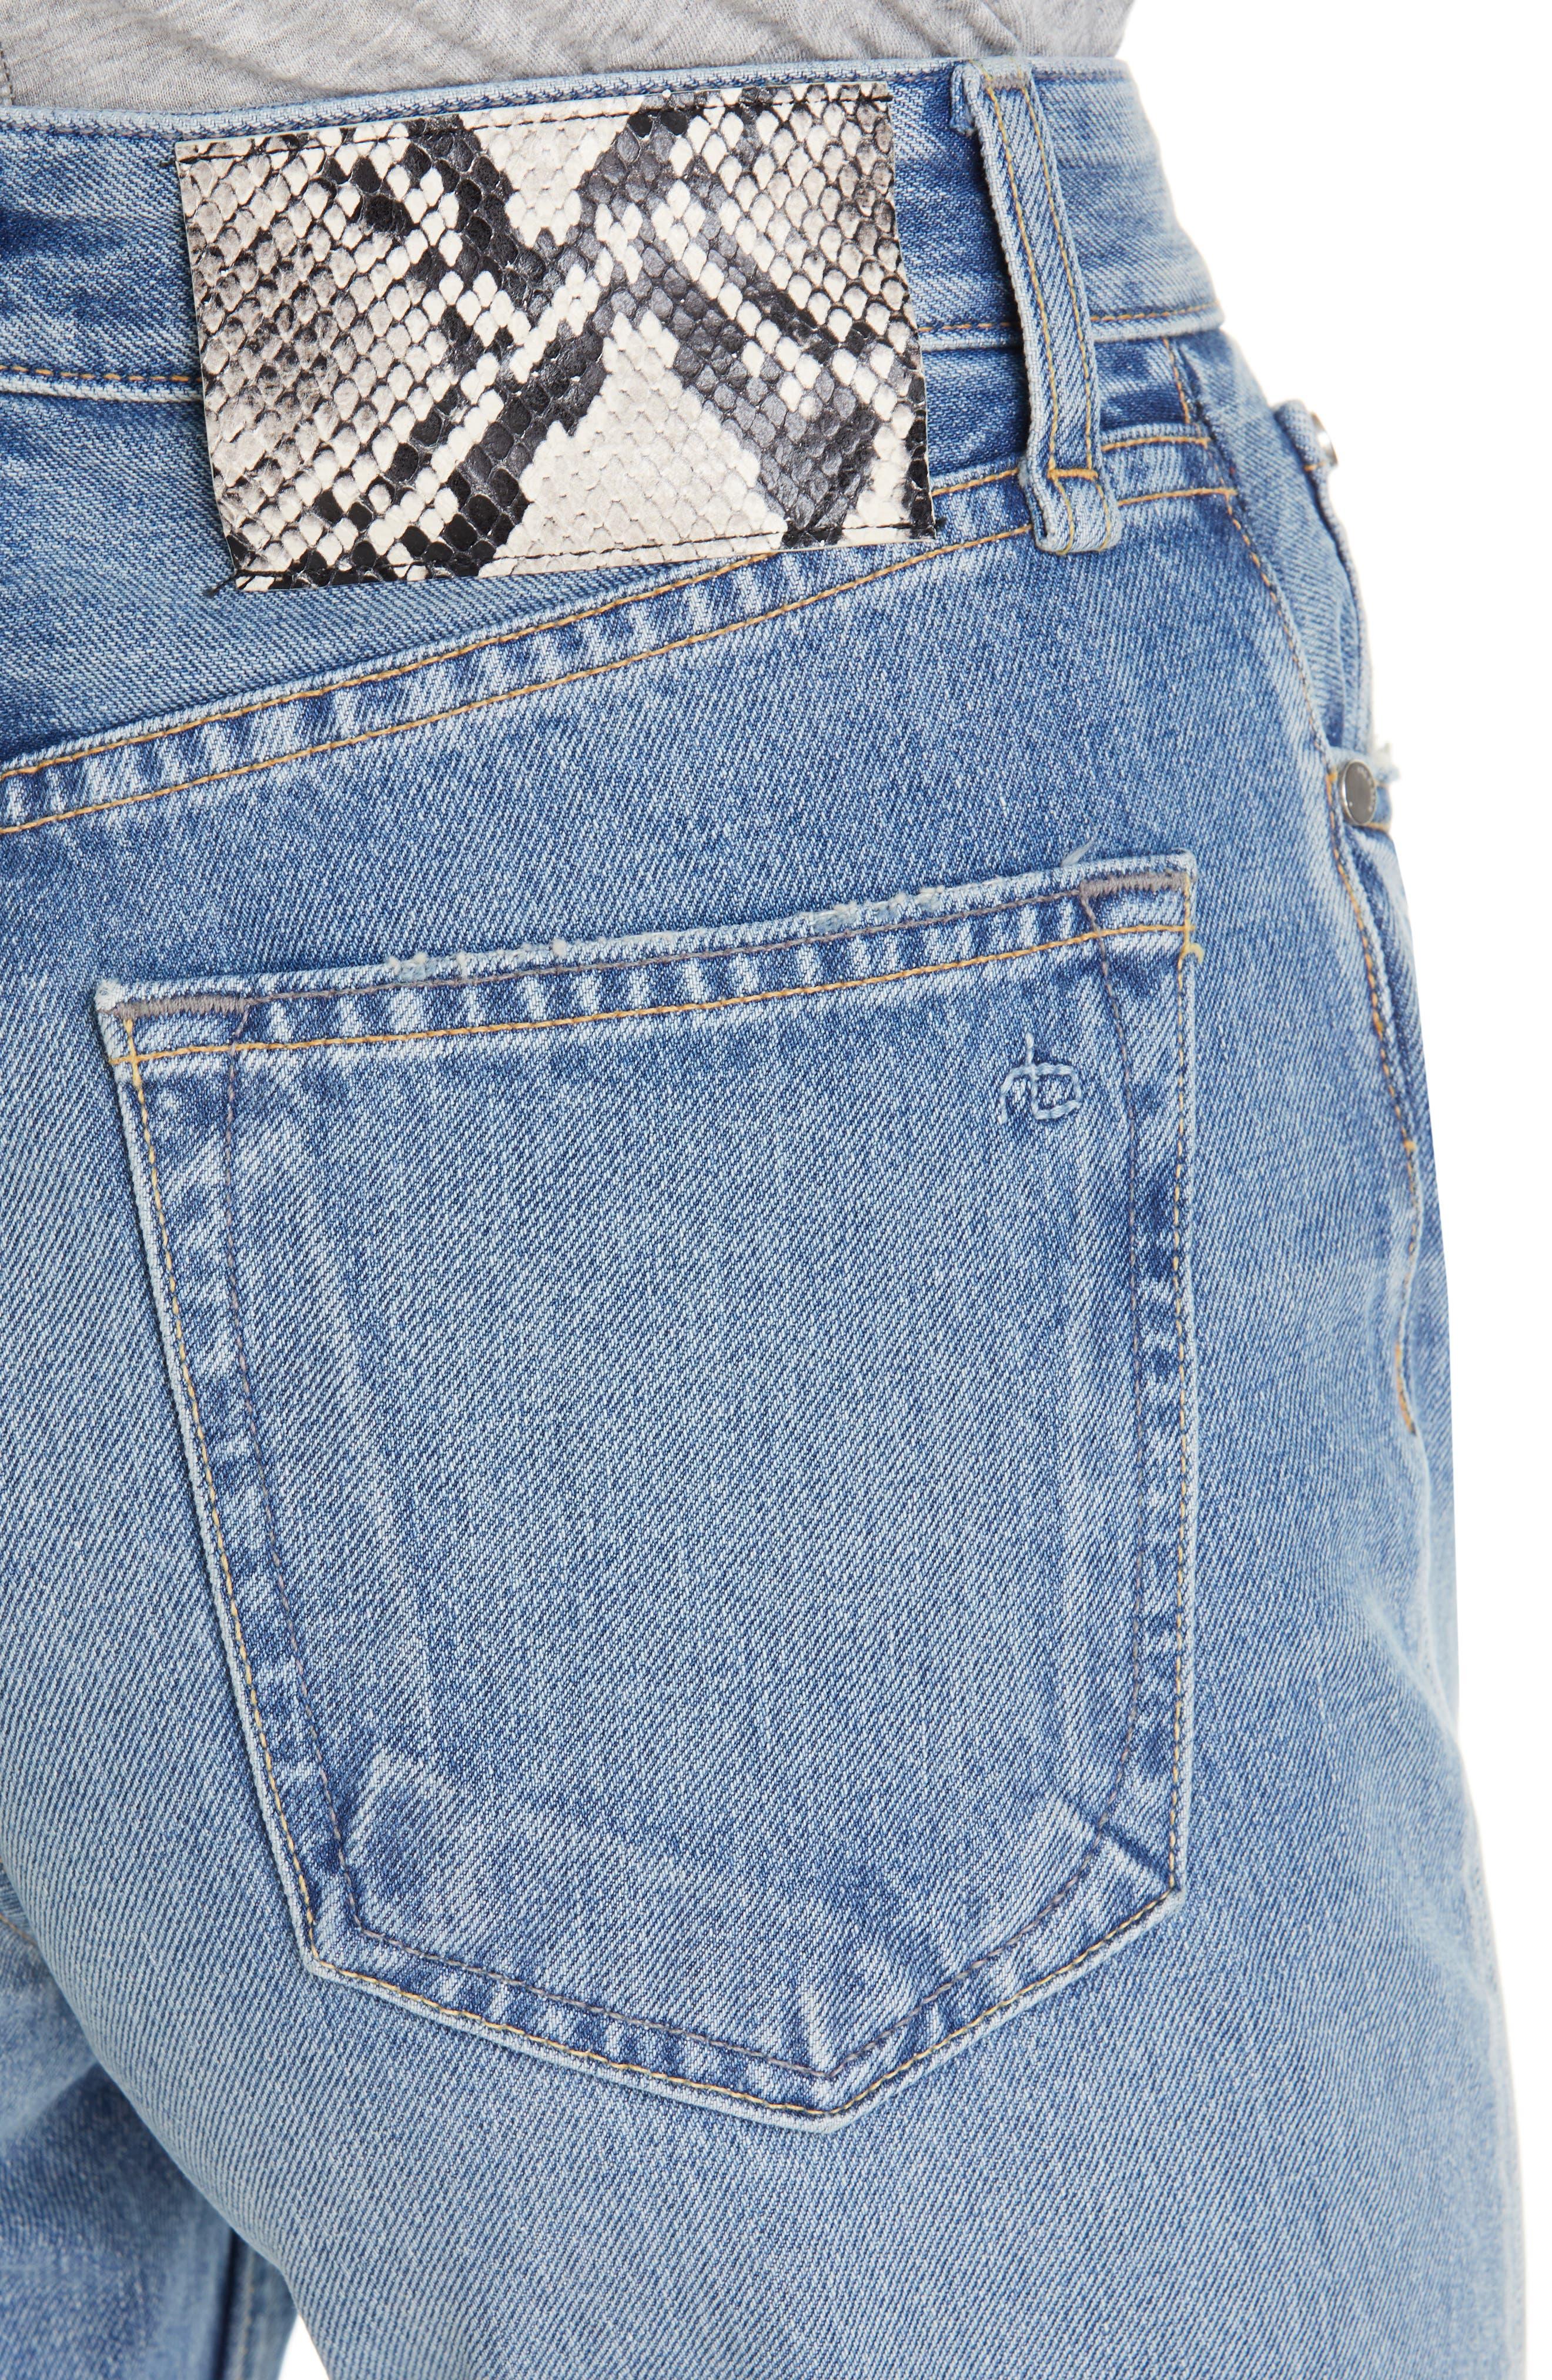 RAG & BONE, Ruth Super High Waist Straight Leg Jeans, Alternate thumbnail 4, color, BABY